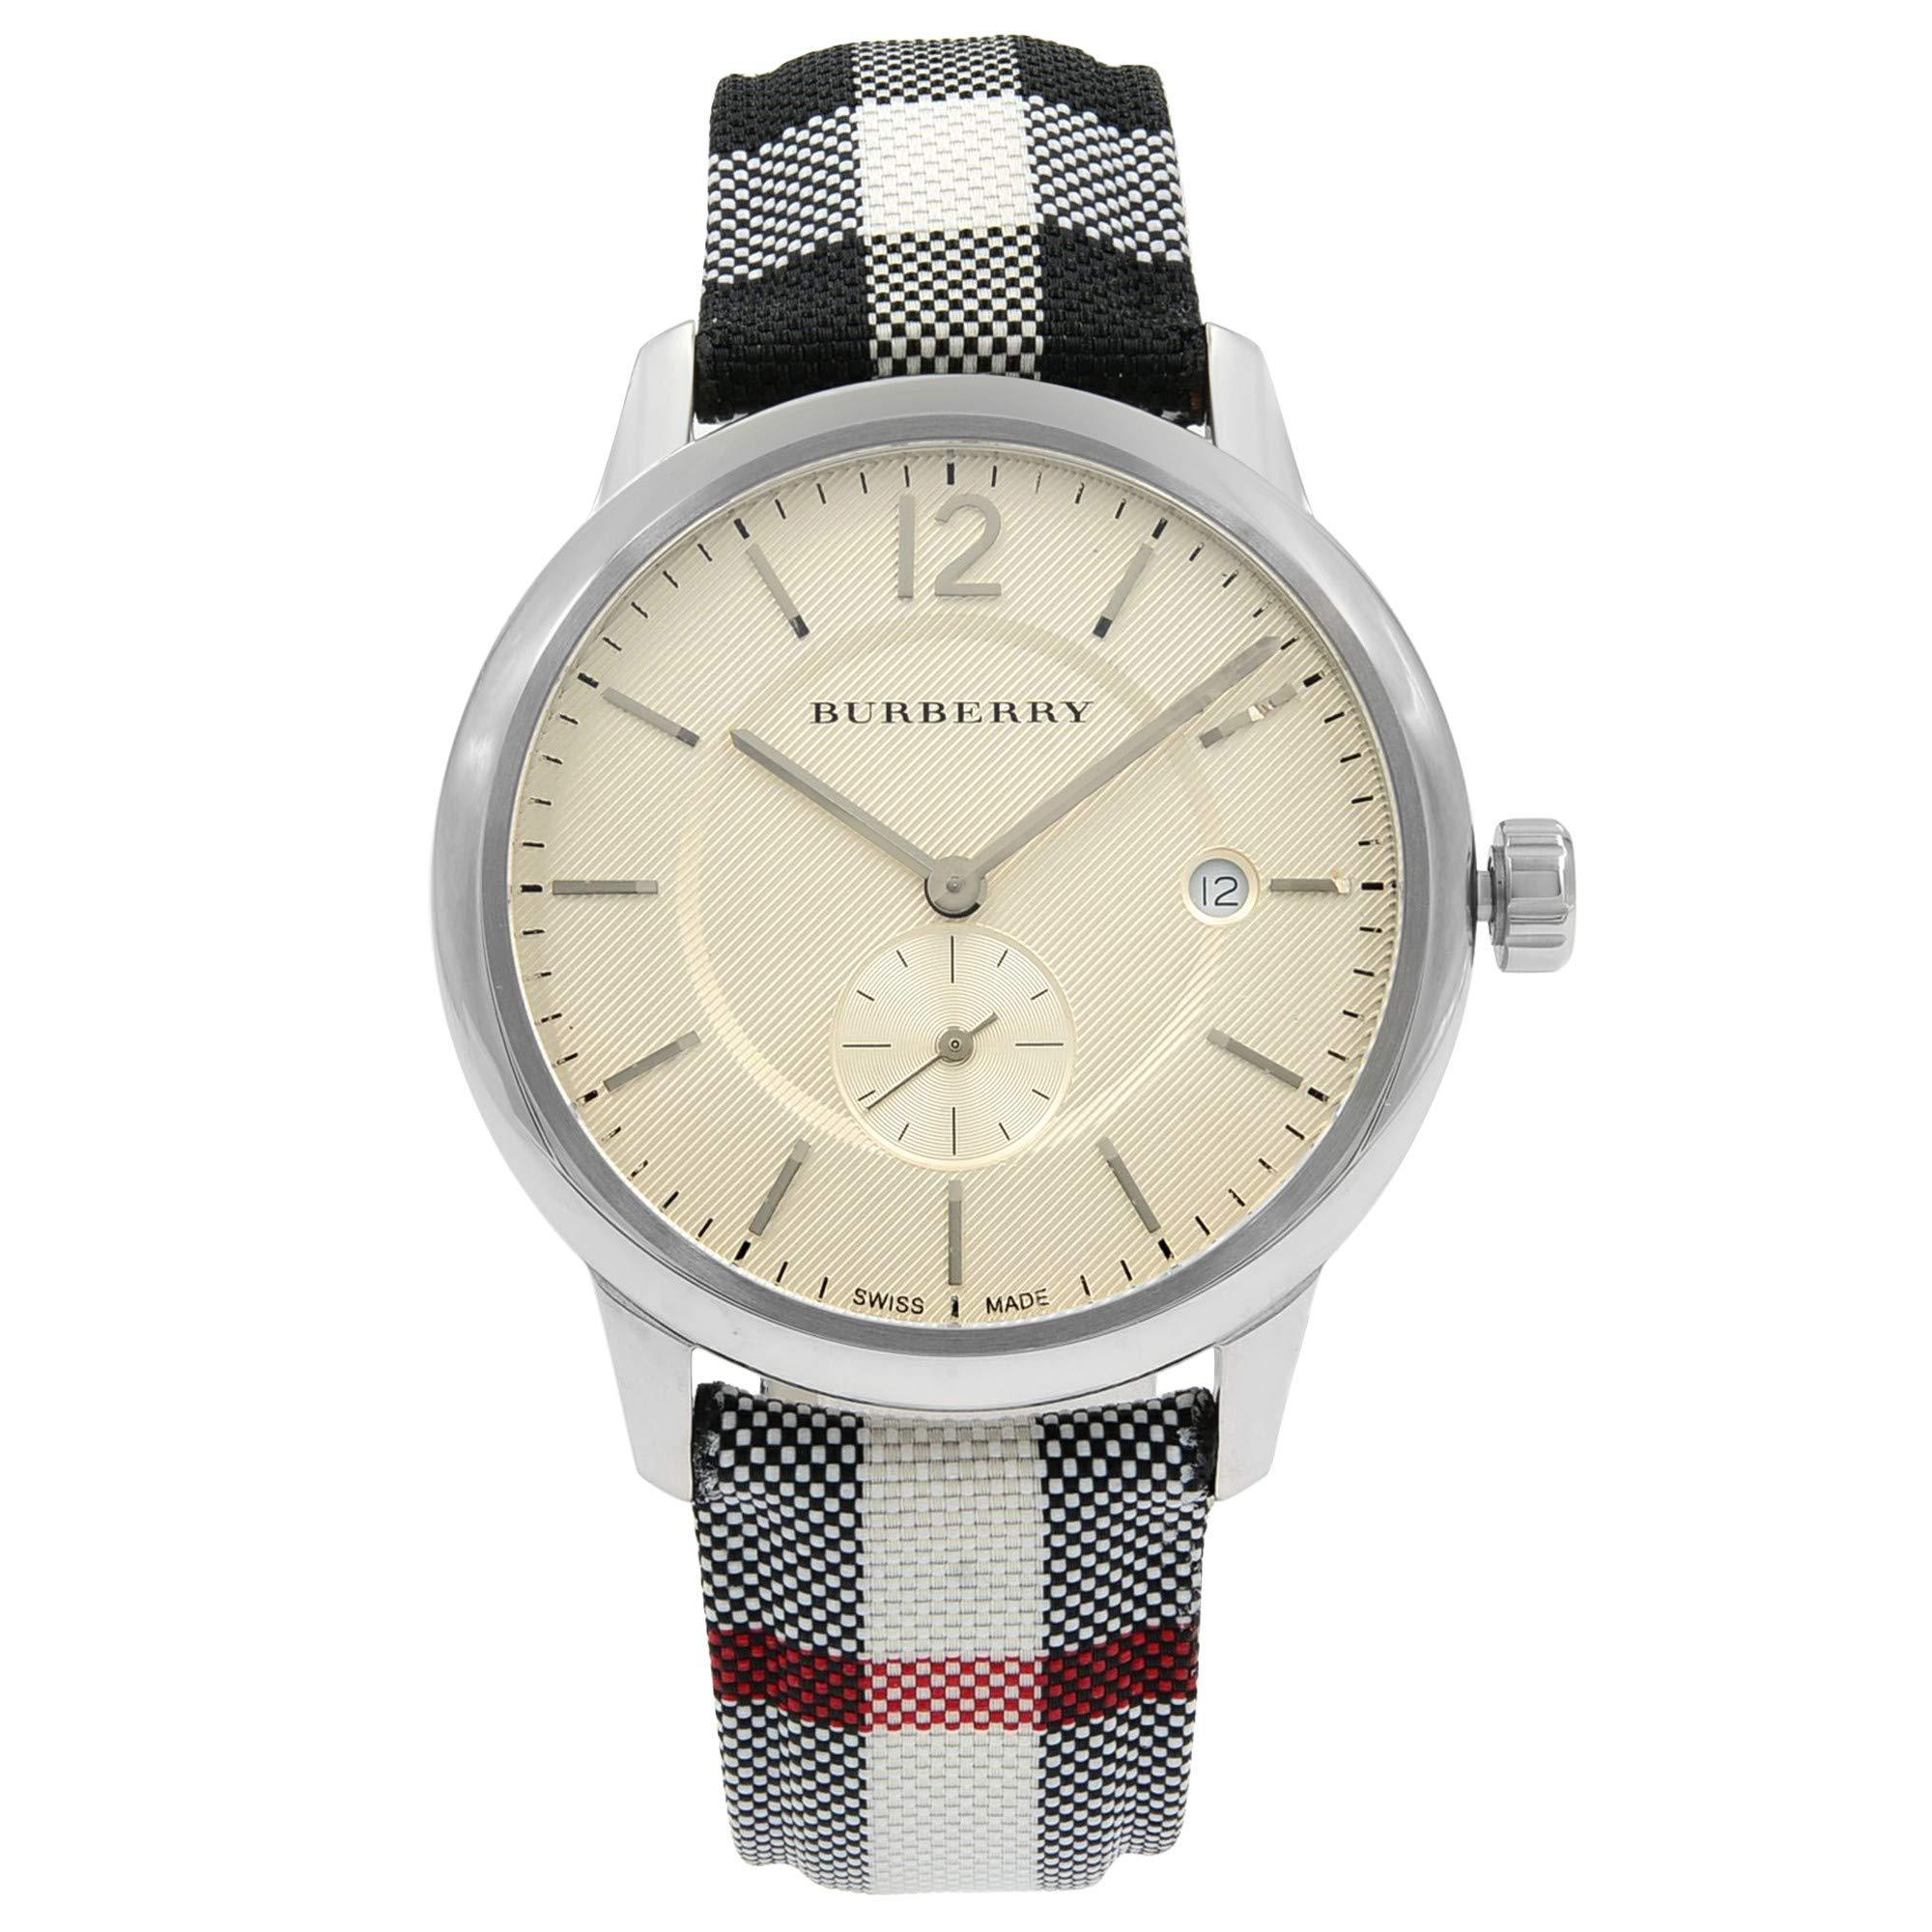 Burberry The Classic Round Quartz Male Watch BU10002 (Certified Pre-Owned)